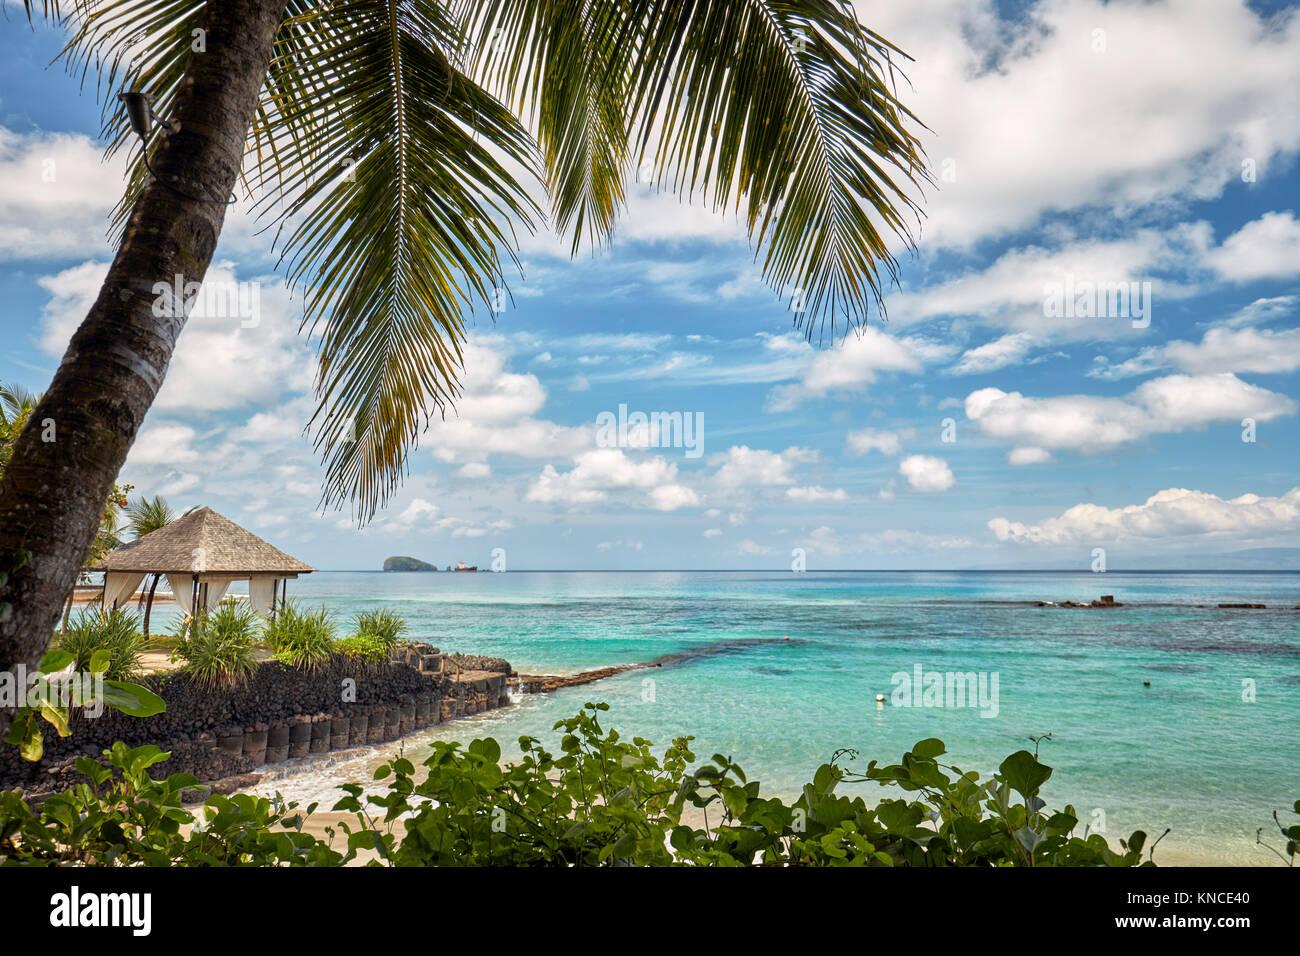 View of the Mendira Bay from Candi Beach Resort and Spa. Candidasa, Manggis subdistrict, Karangasem regency, Bali, Stock Photo